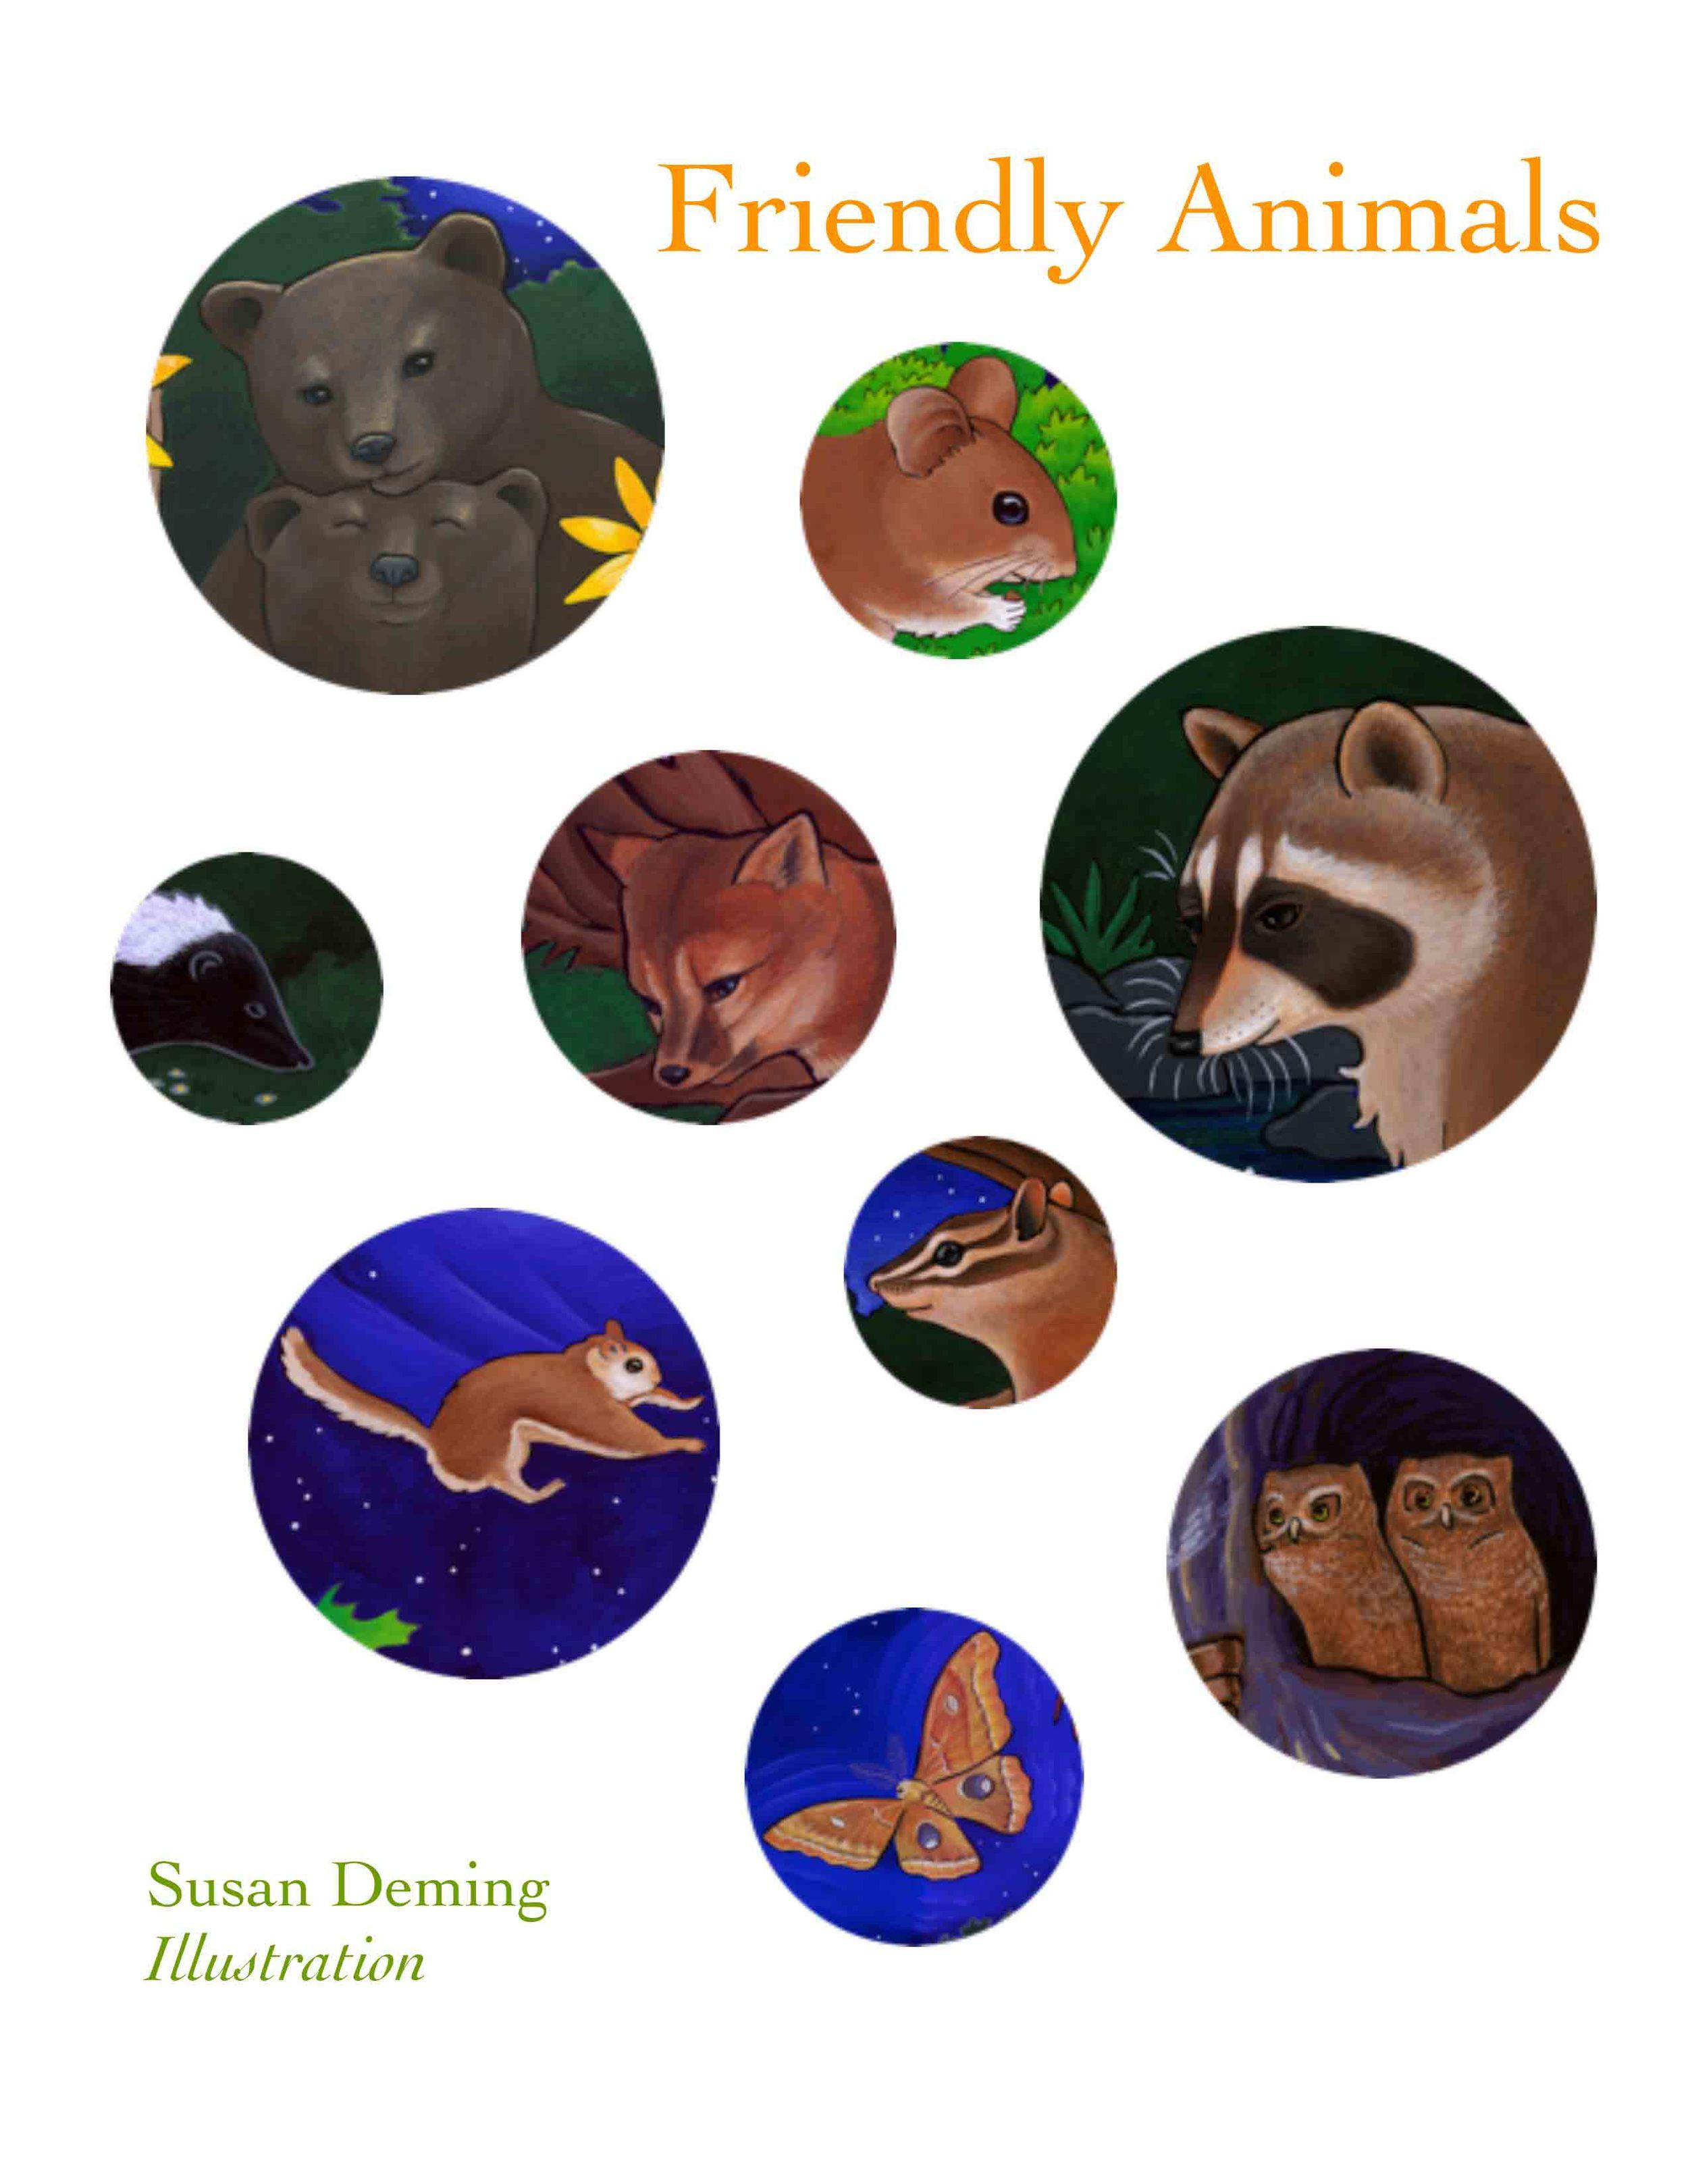 shining moon presentation friendly animals2.jpg